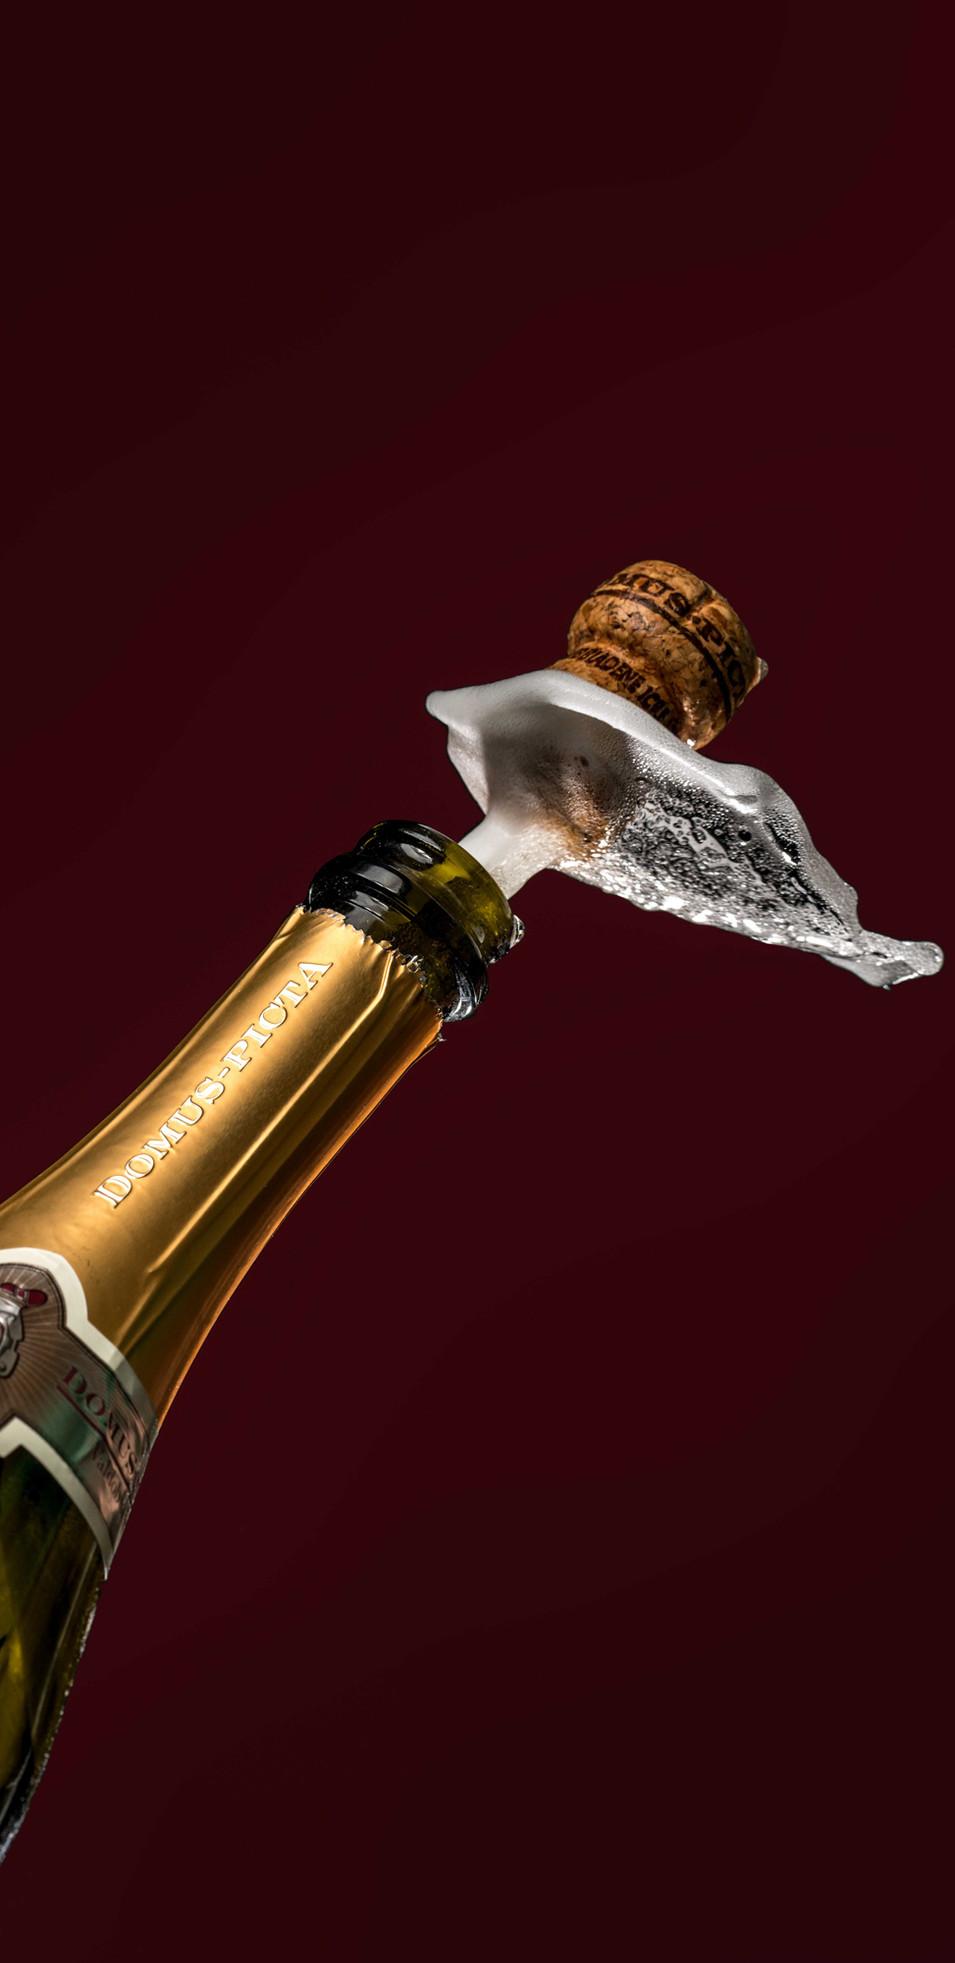 render bottiglia still life prodotto vin